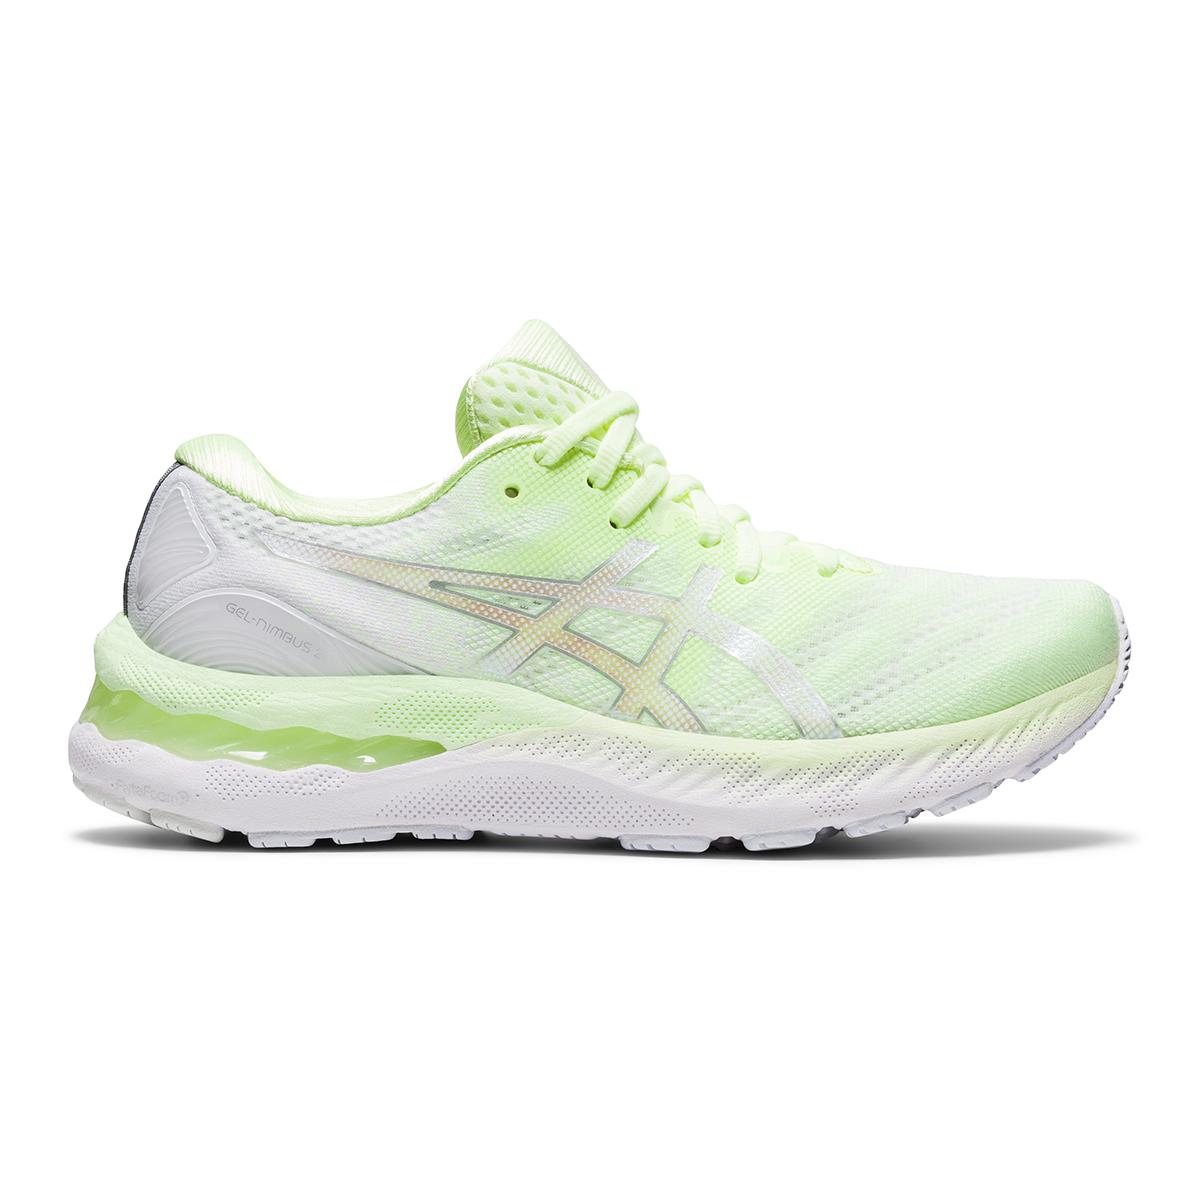 Women's Asics Gel-Nimbus 23 Running Shoe - Color: Illuminate Yellow - Size: 5 - Width: Regular, Illuminate Yellow, large, image 1